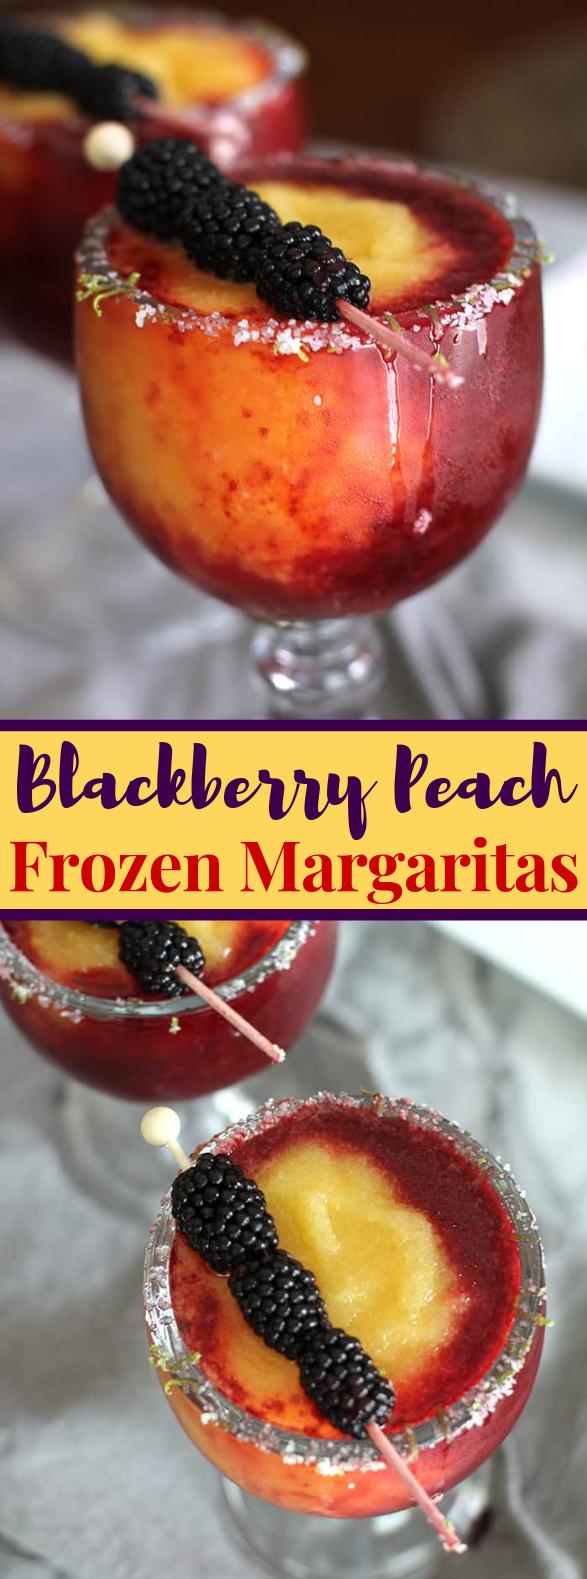 Blackberry Peach Frozen Margaritas #mixeddrink #drinks